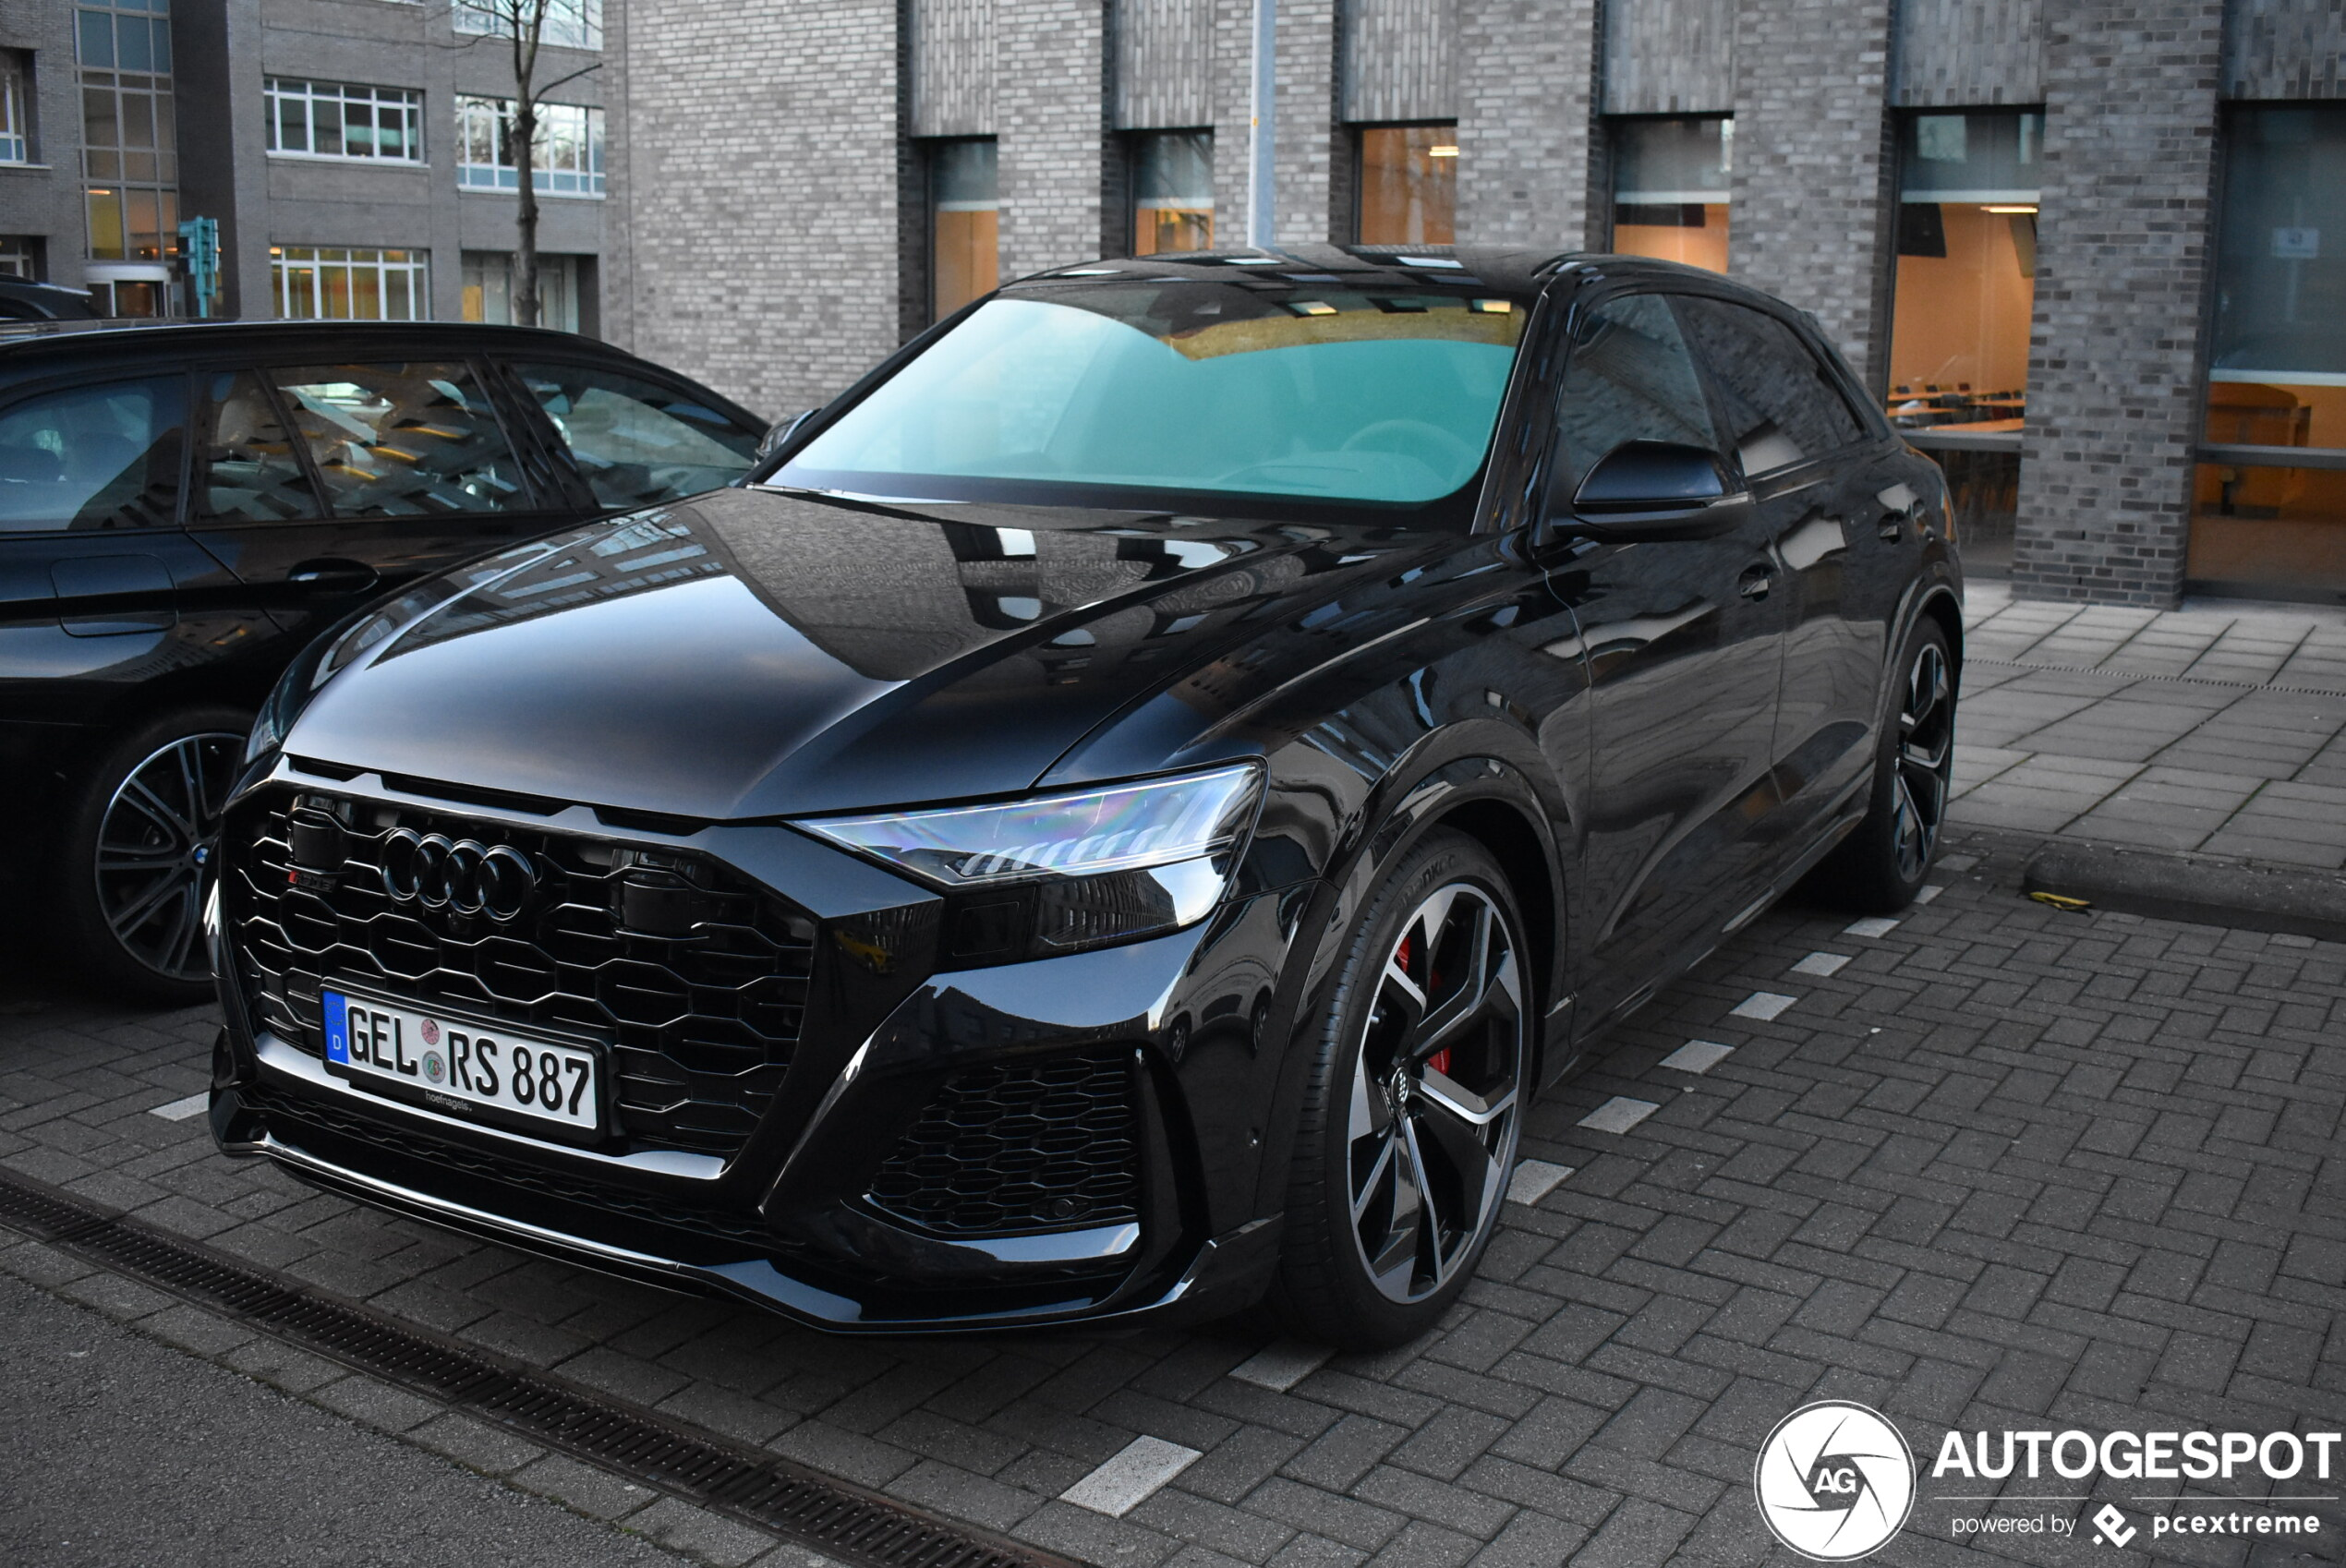 Audi RS Q8 - 16 January 2020 - Autogespot